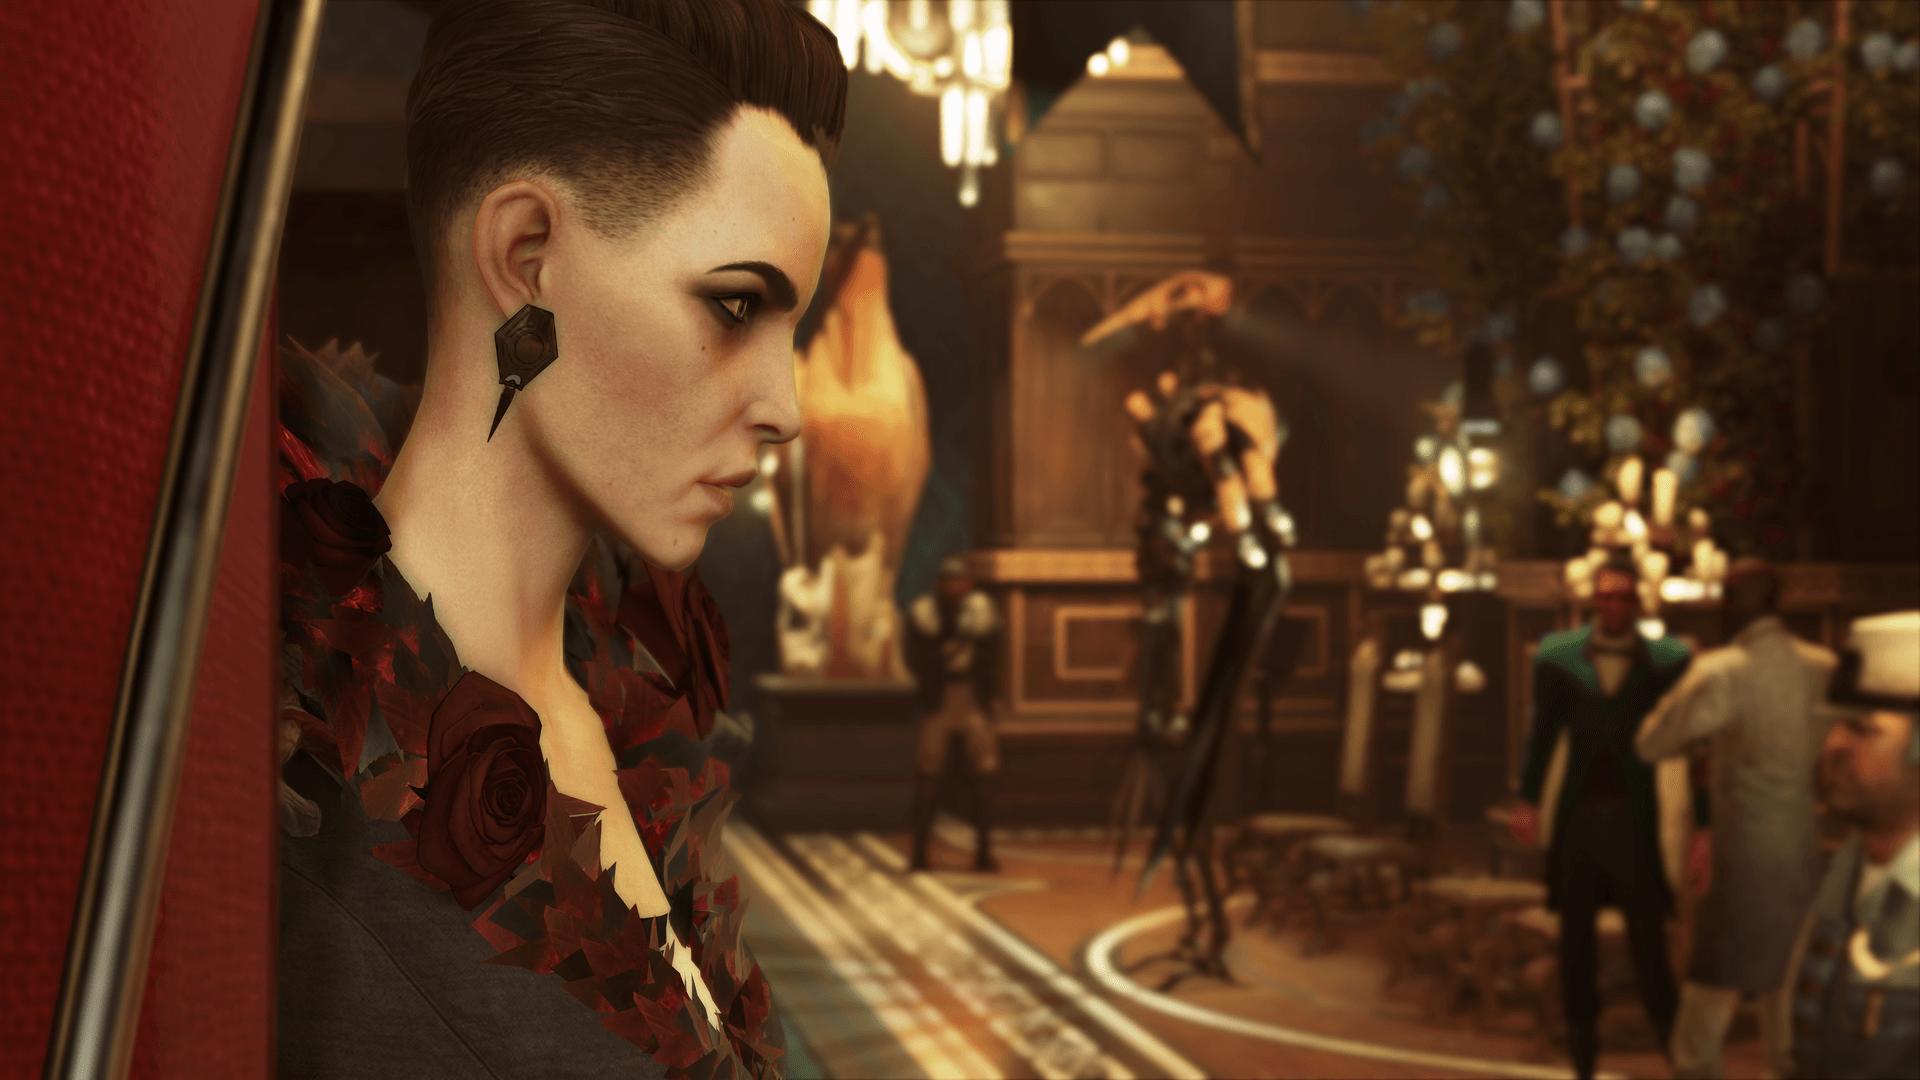 Nové screenshoty z Dishonored 2 130247